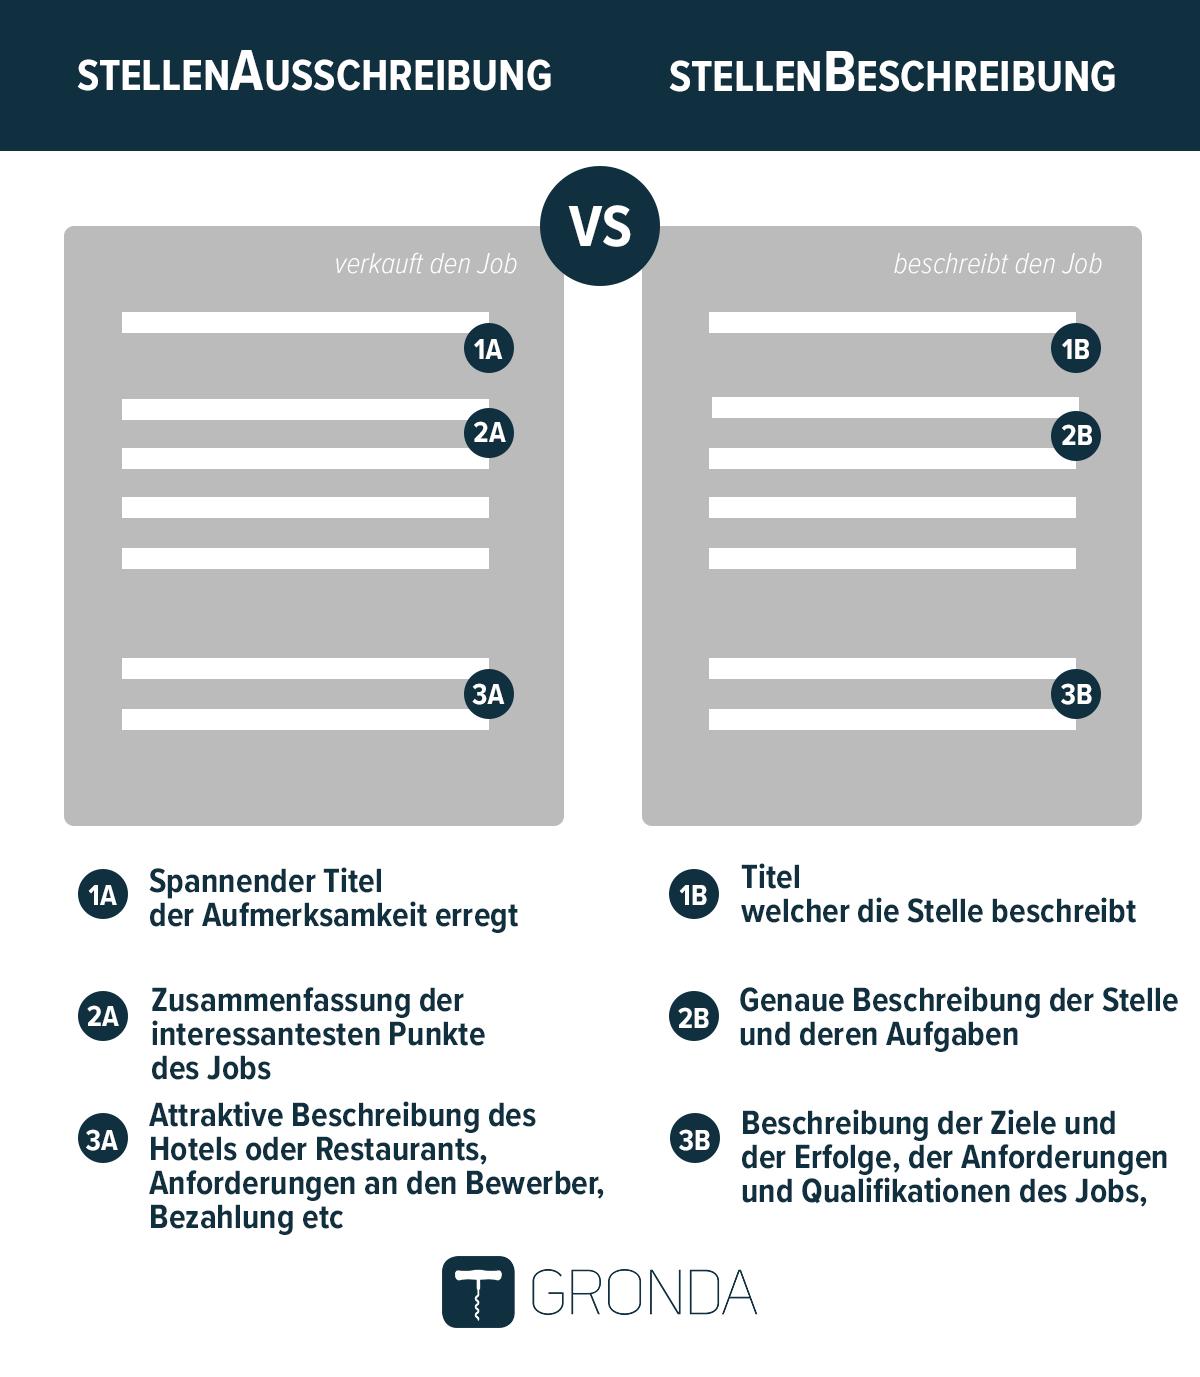 Stellenausschreibung vs Stellenbeschreibung